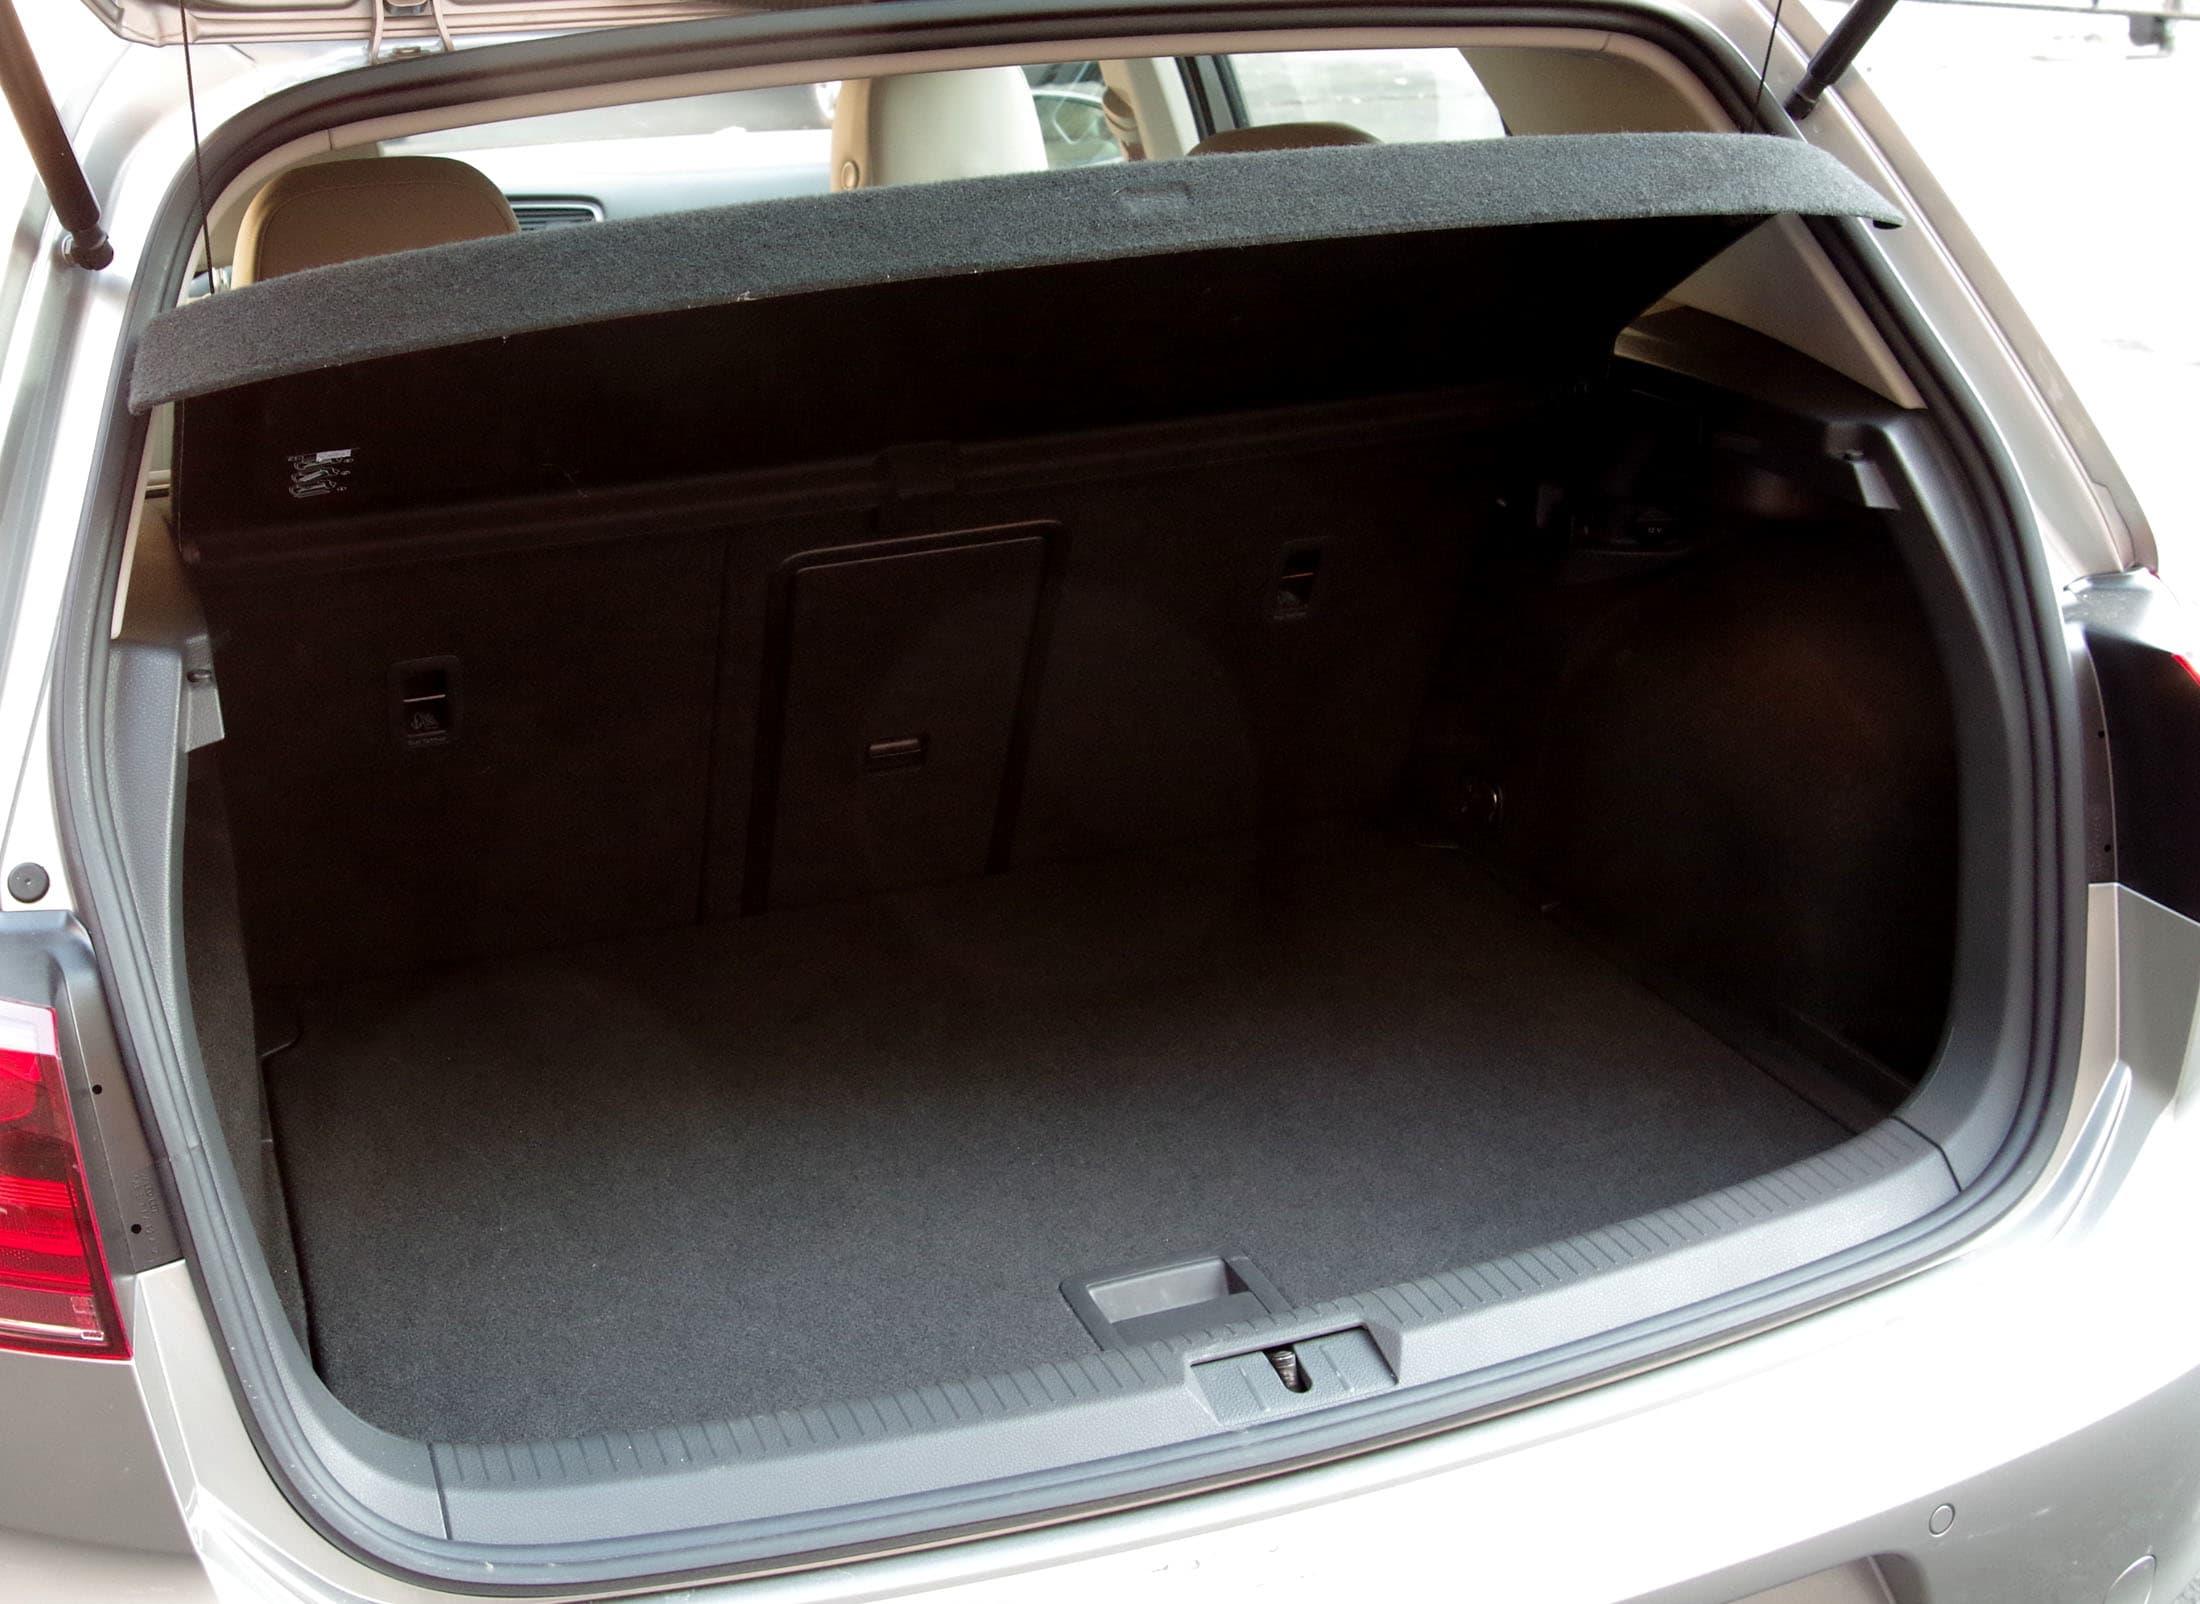 2015 VW Golf trunk